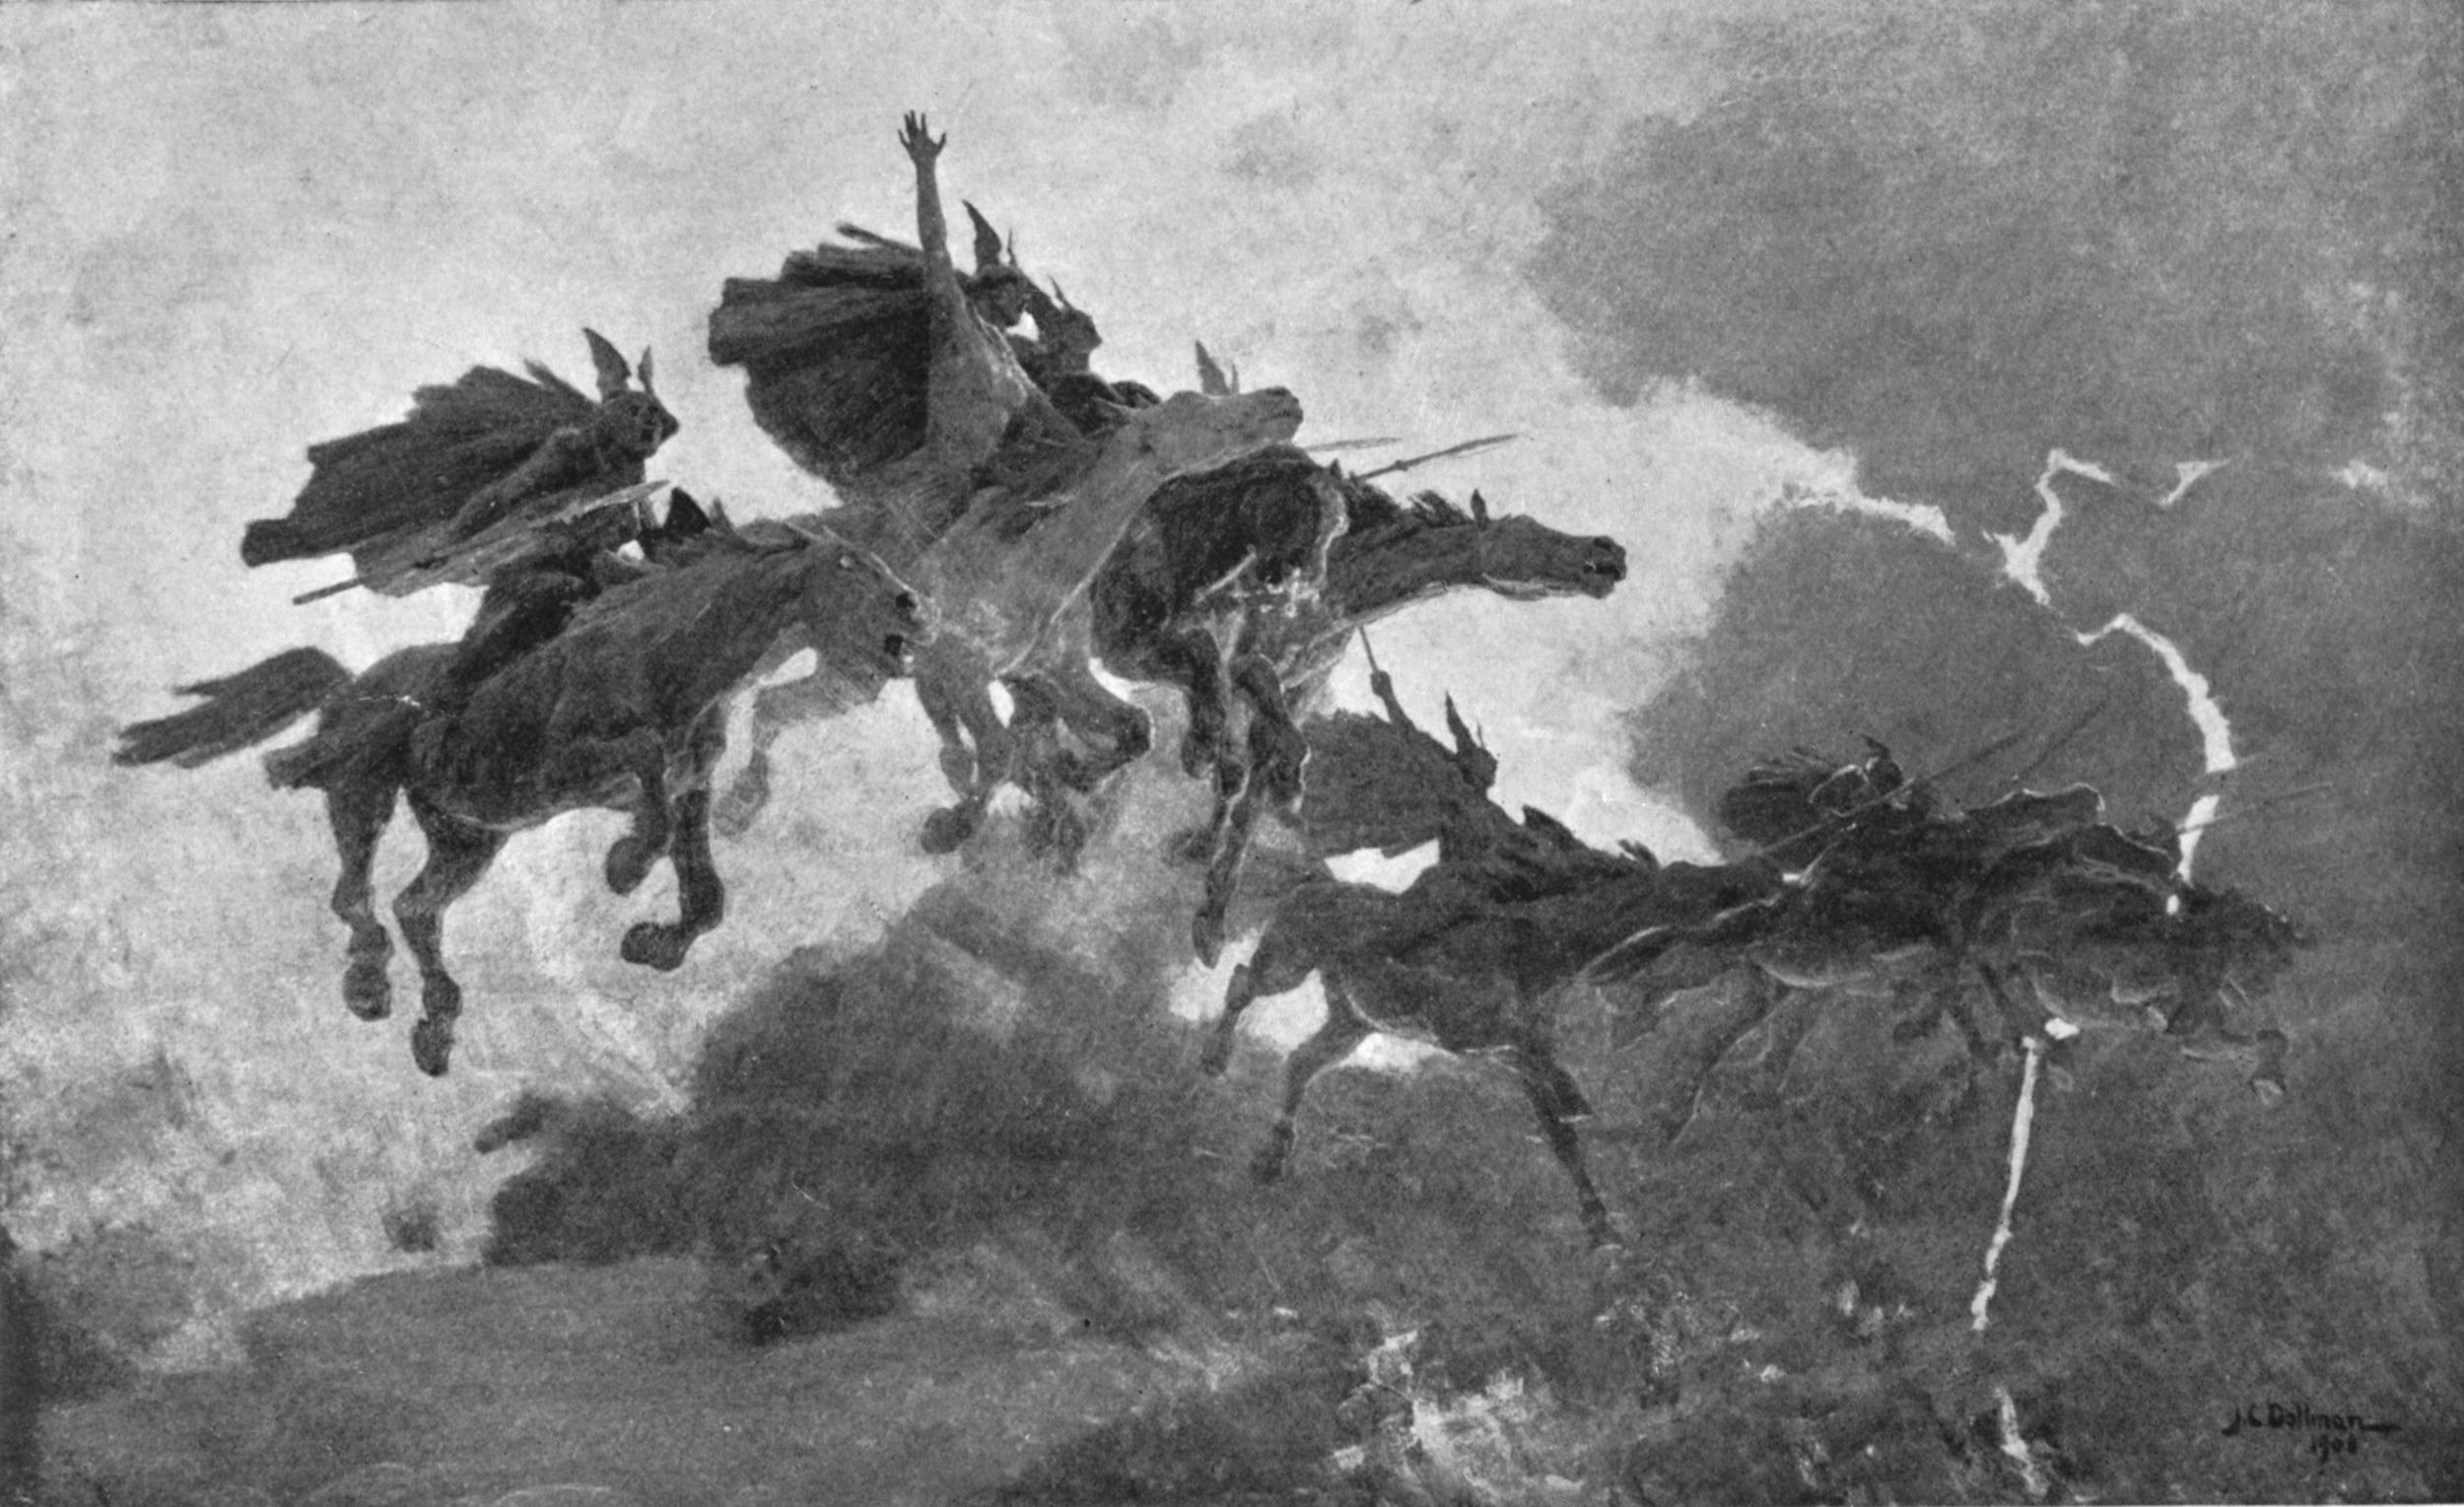 Ride of the Valkyrs (1909) John Charles Dollman